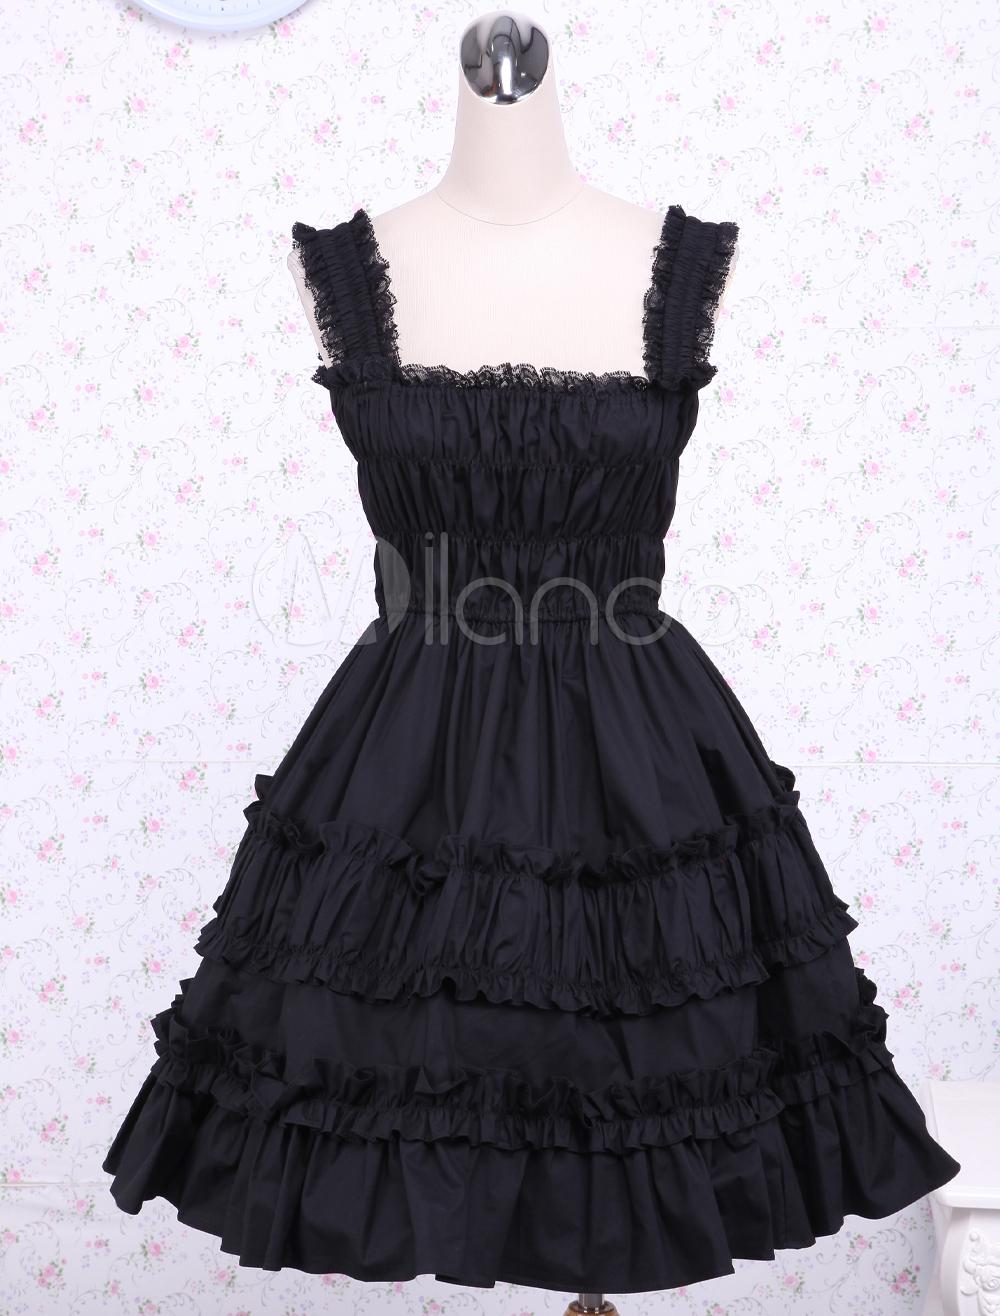 Buy Cotton Black Lace Ruffles Classic Lolita Dress for $79.99 in Milanoo store